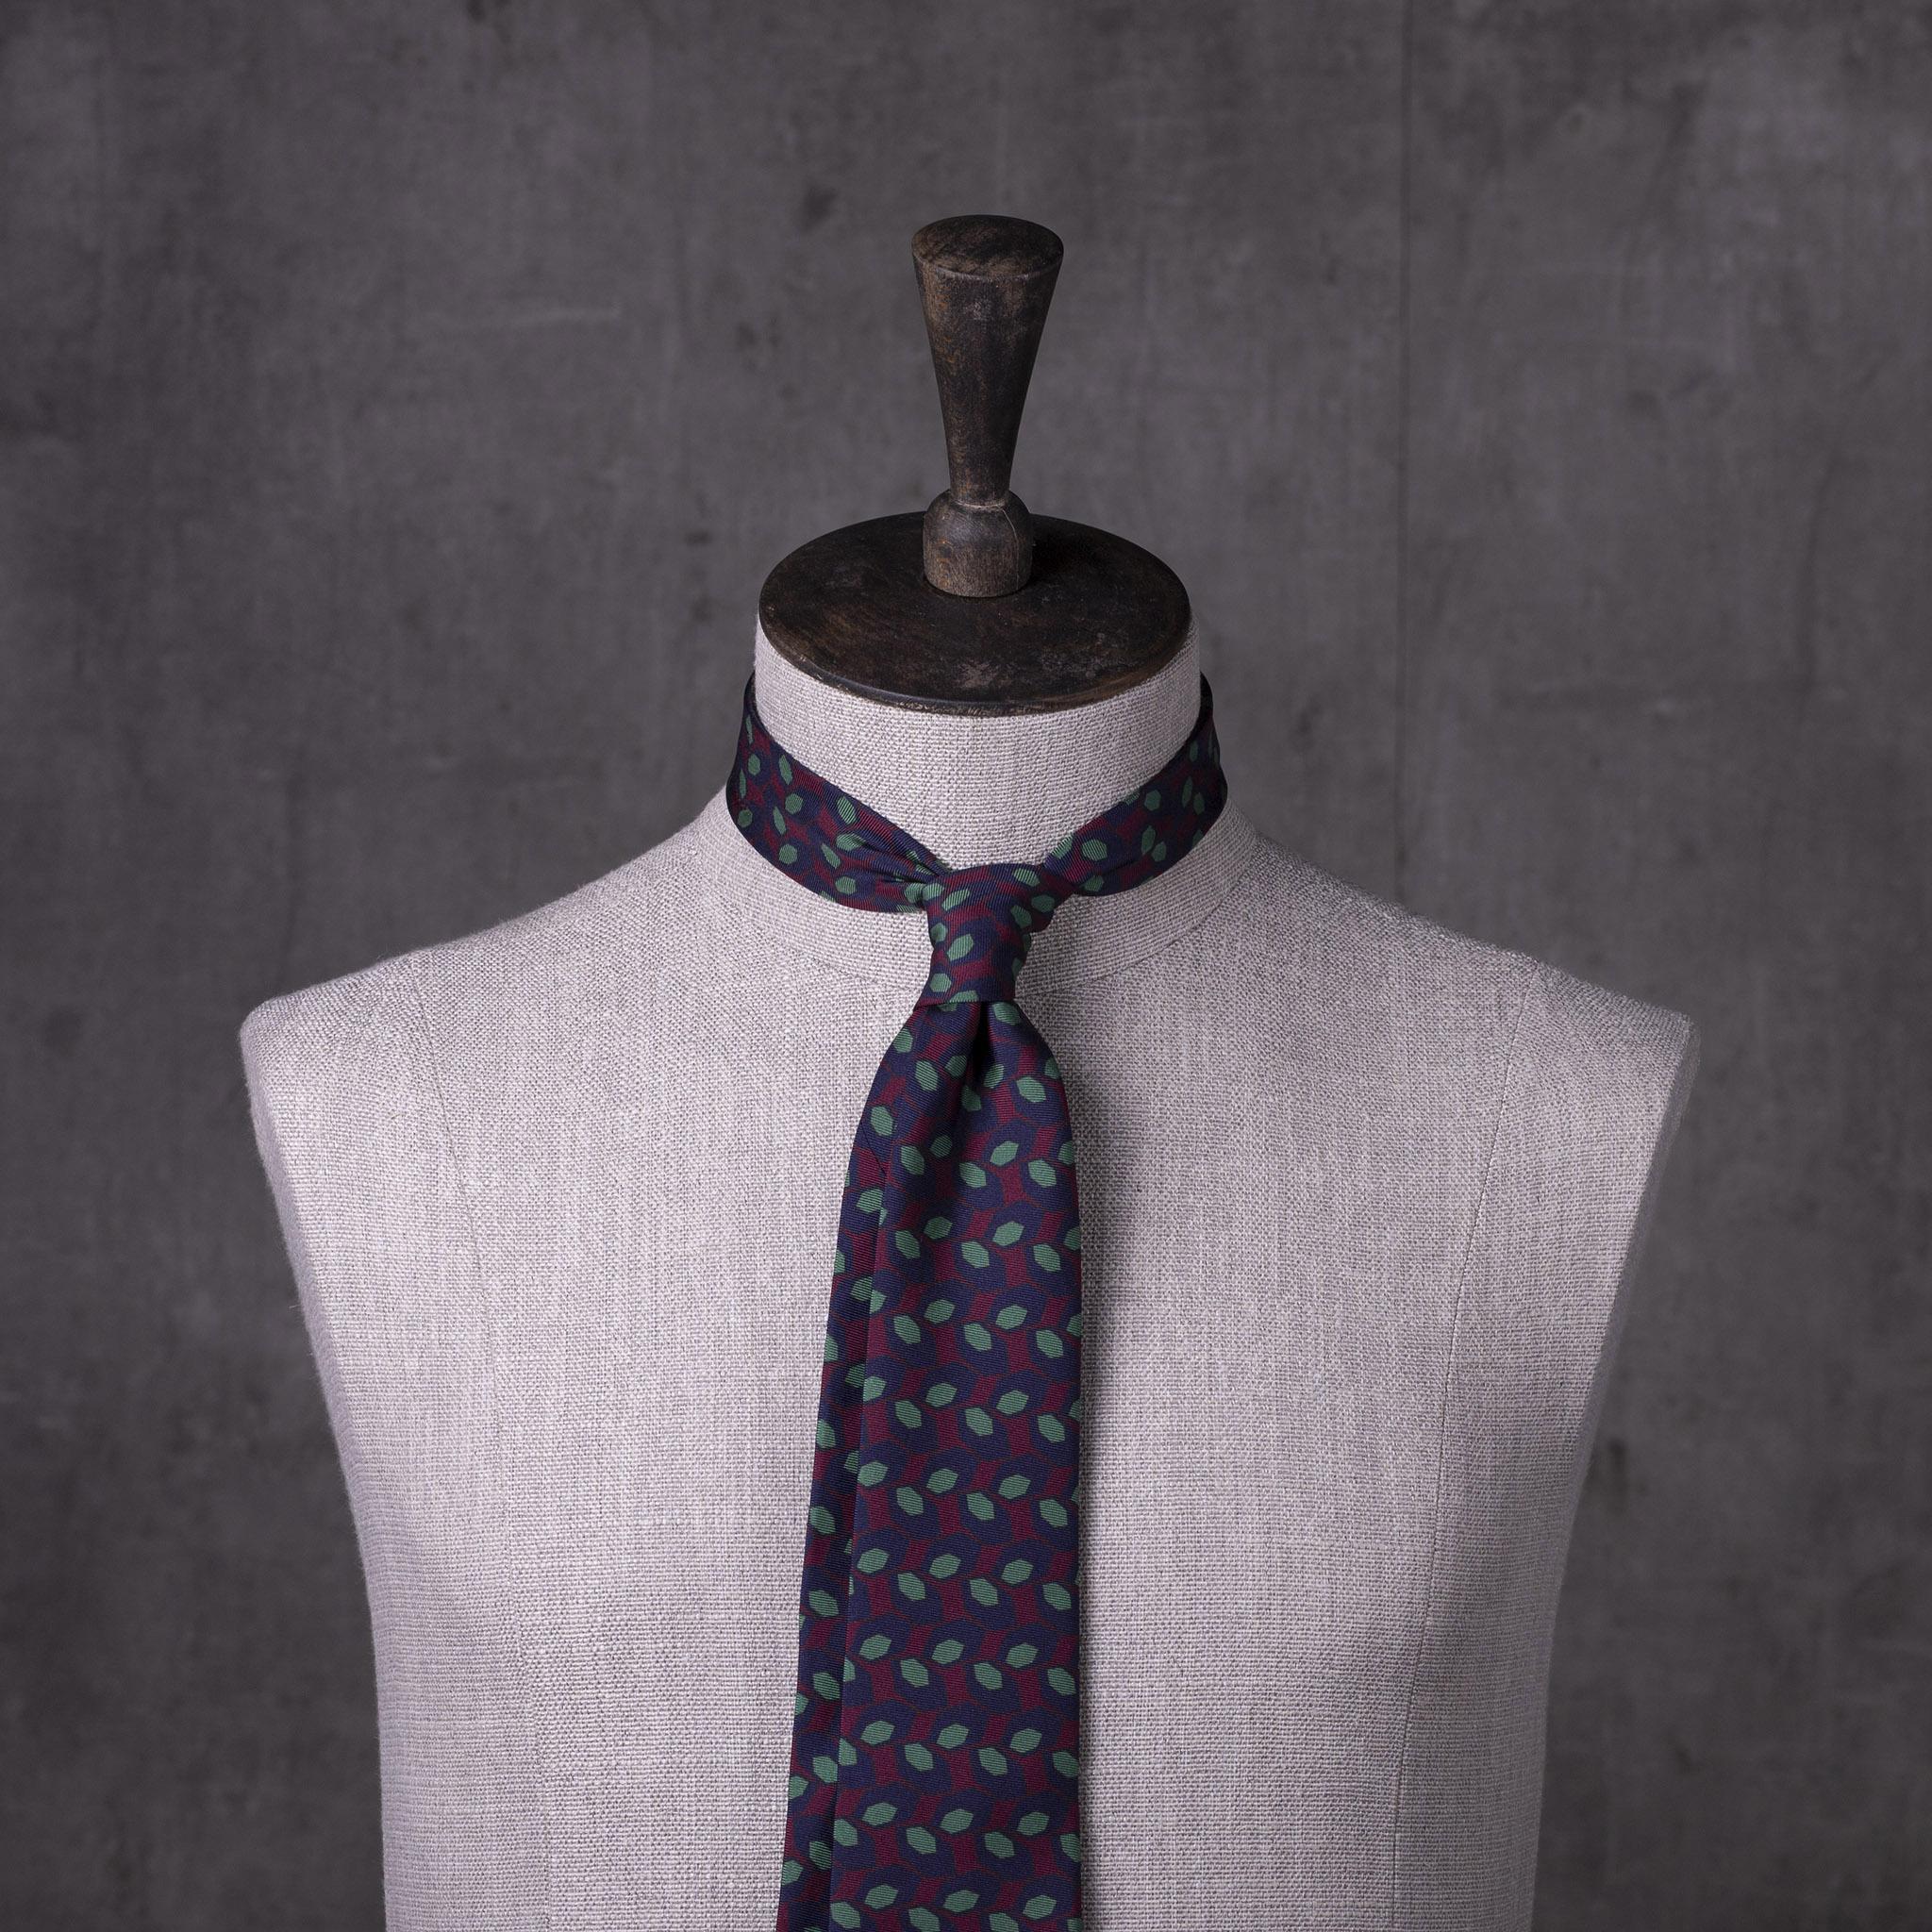 PRINTED-SILK-SEDA-ESTAMPADA-0493-Tie-Initials-Corbata-Iniciales-The-Seelk-2